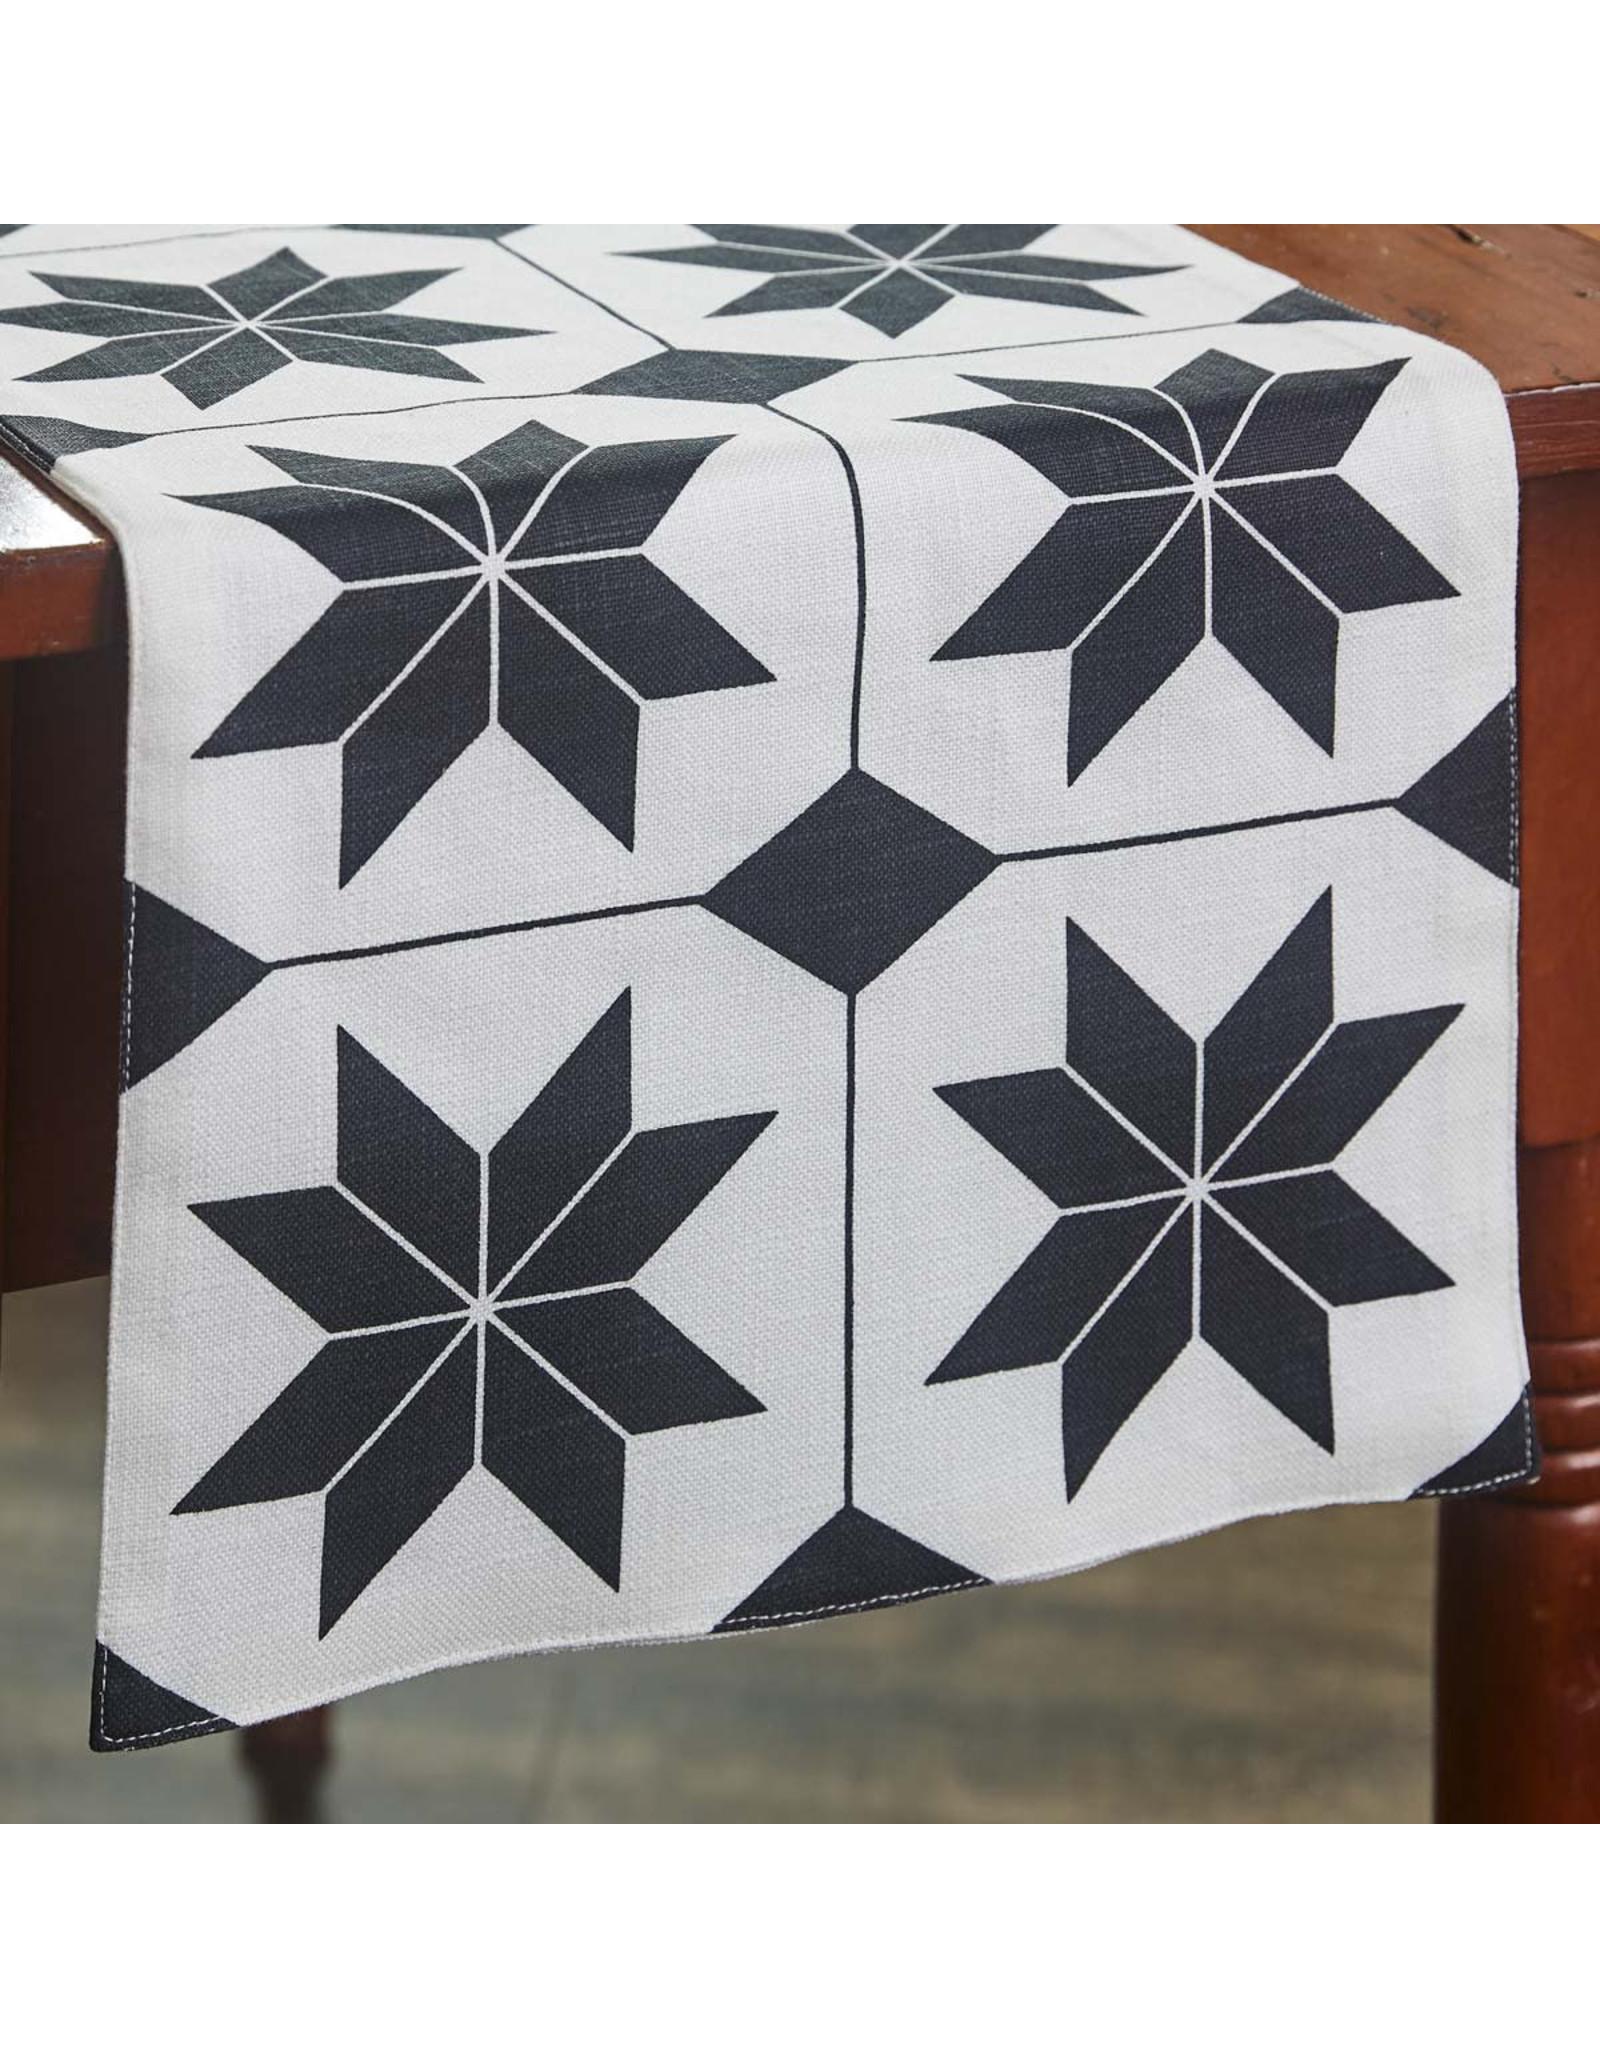 "Park Designs Quilt Table Runner 13"" x 36"""